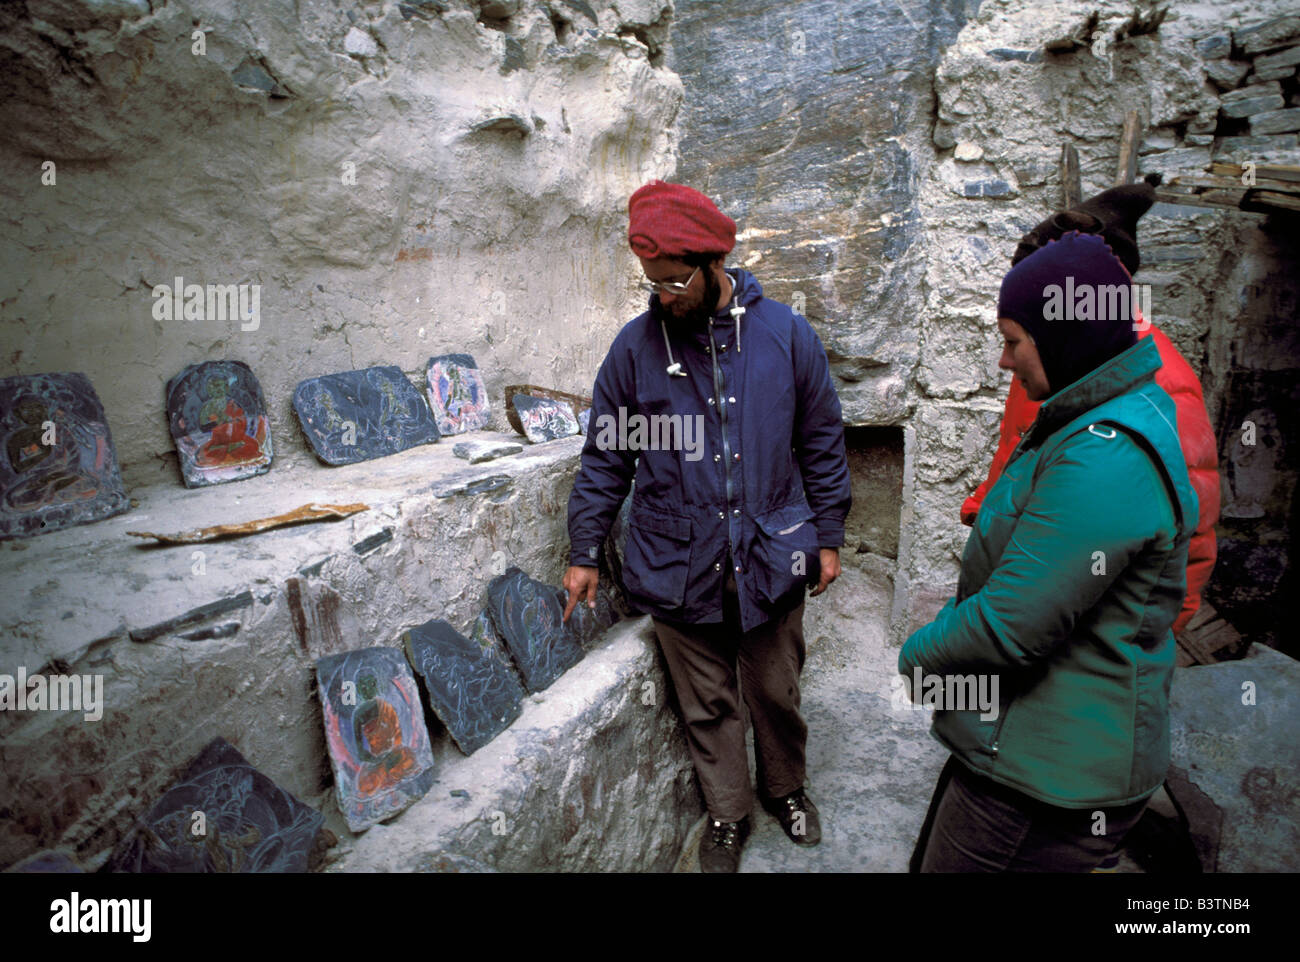 Tibet, Shigatse. Rongbuk Monastery, Buddhist relics. - Stock Image